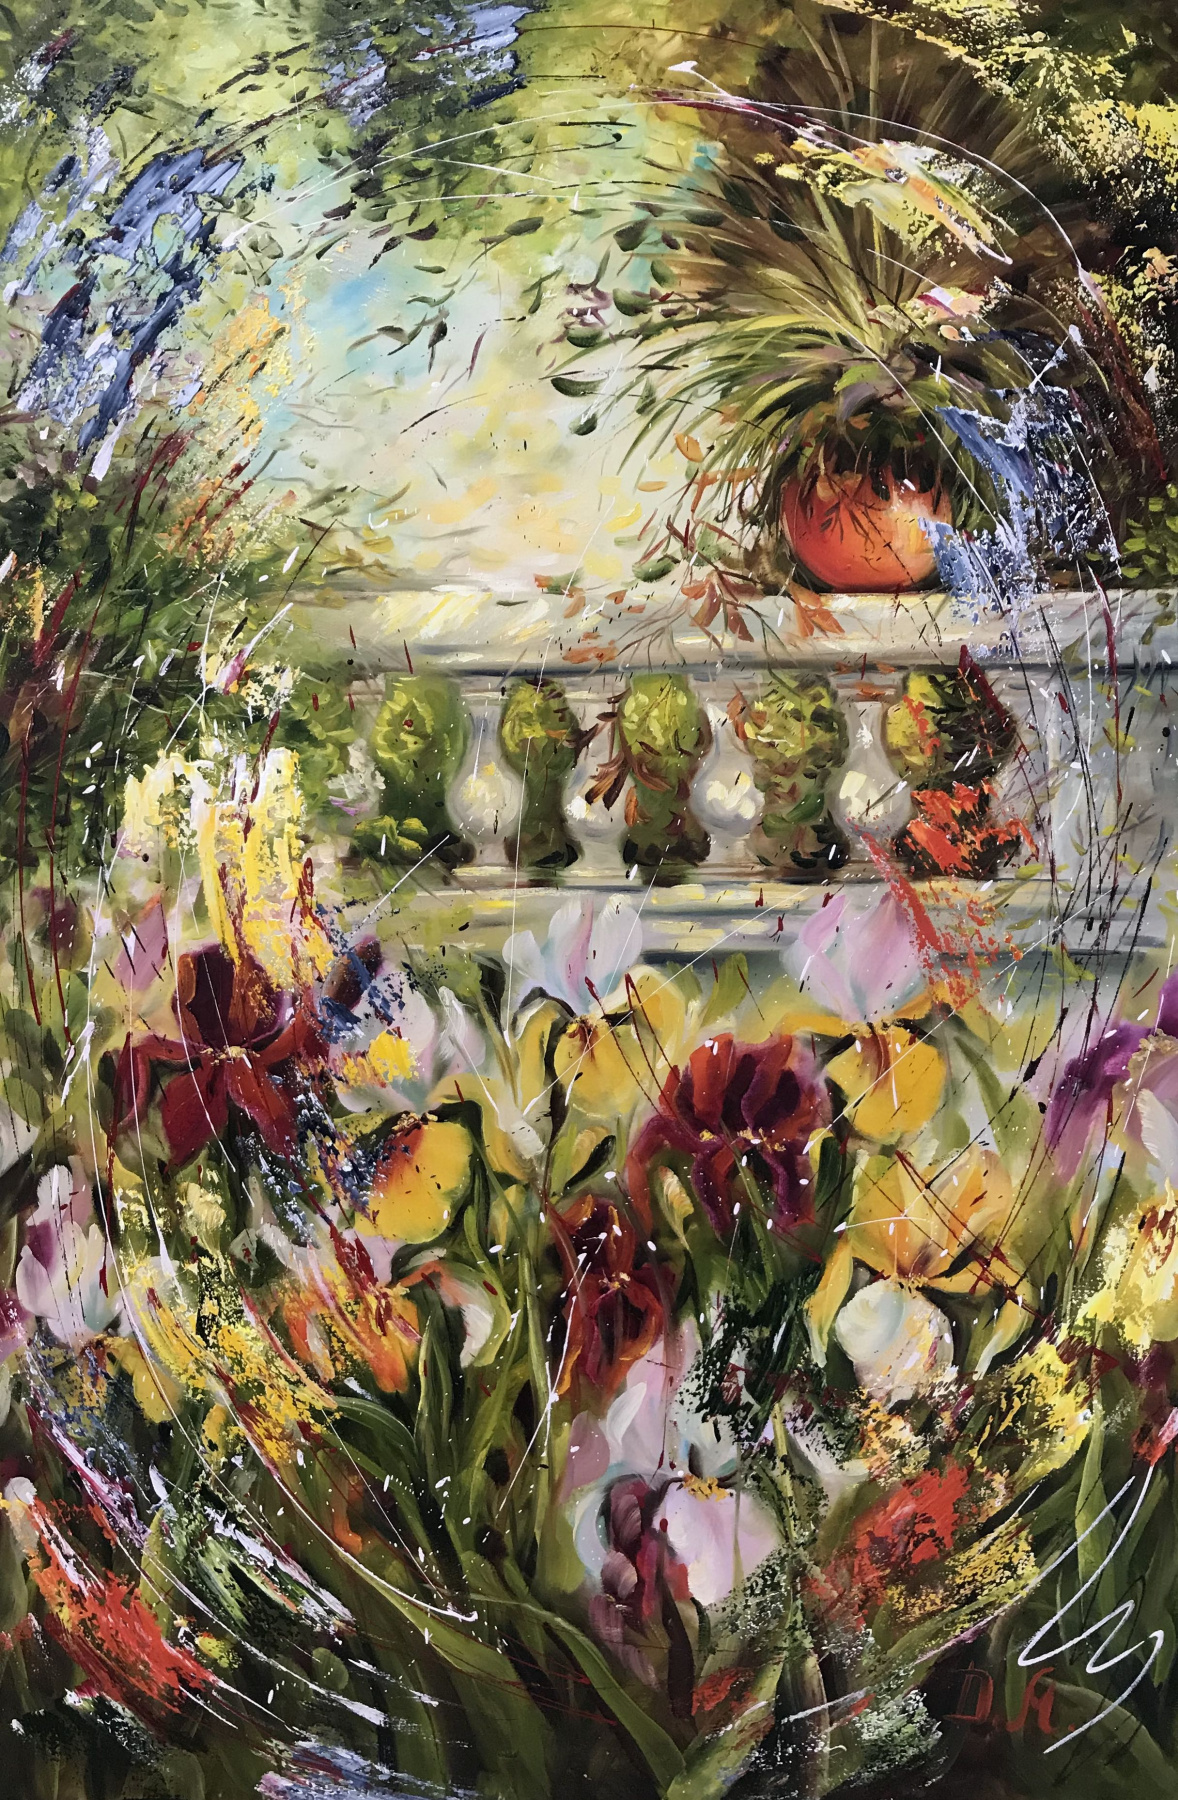 Диана Владимировна Маливани. A Garden in Paris